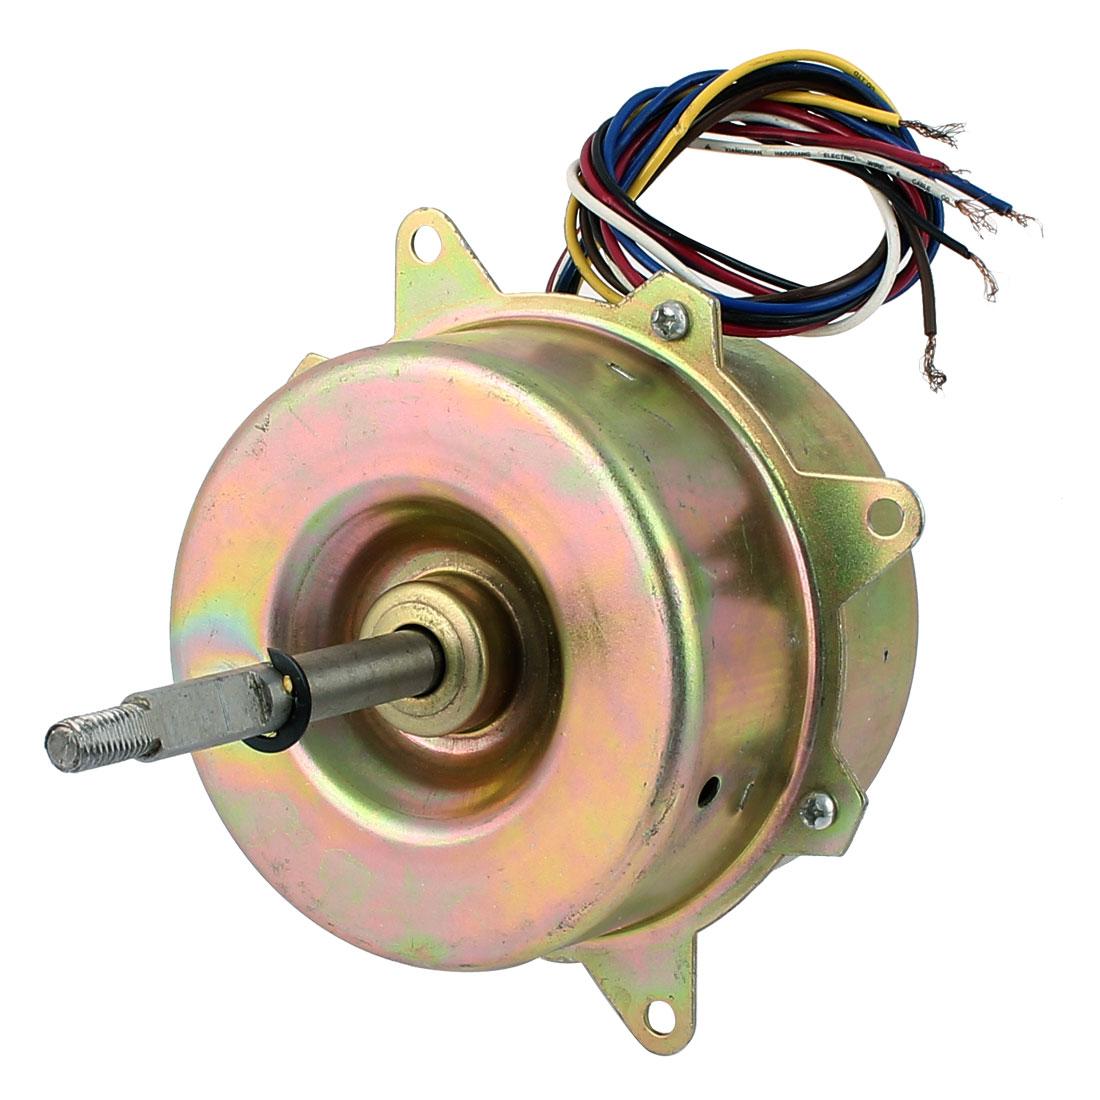 AC 220V 0.6A 45W 1000RPM 10mm x 85mm Shaft Electric Ventilator Fan Motor